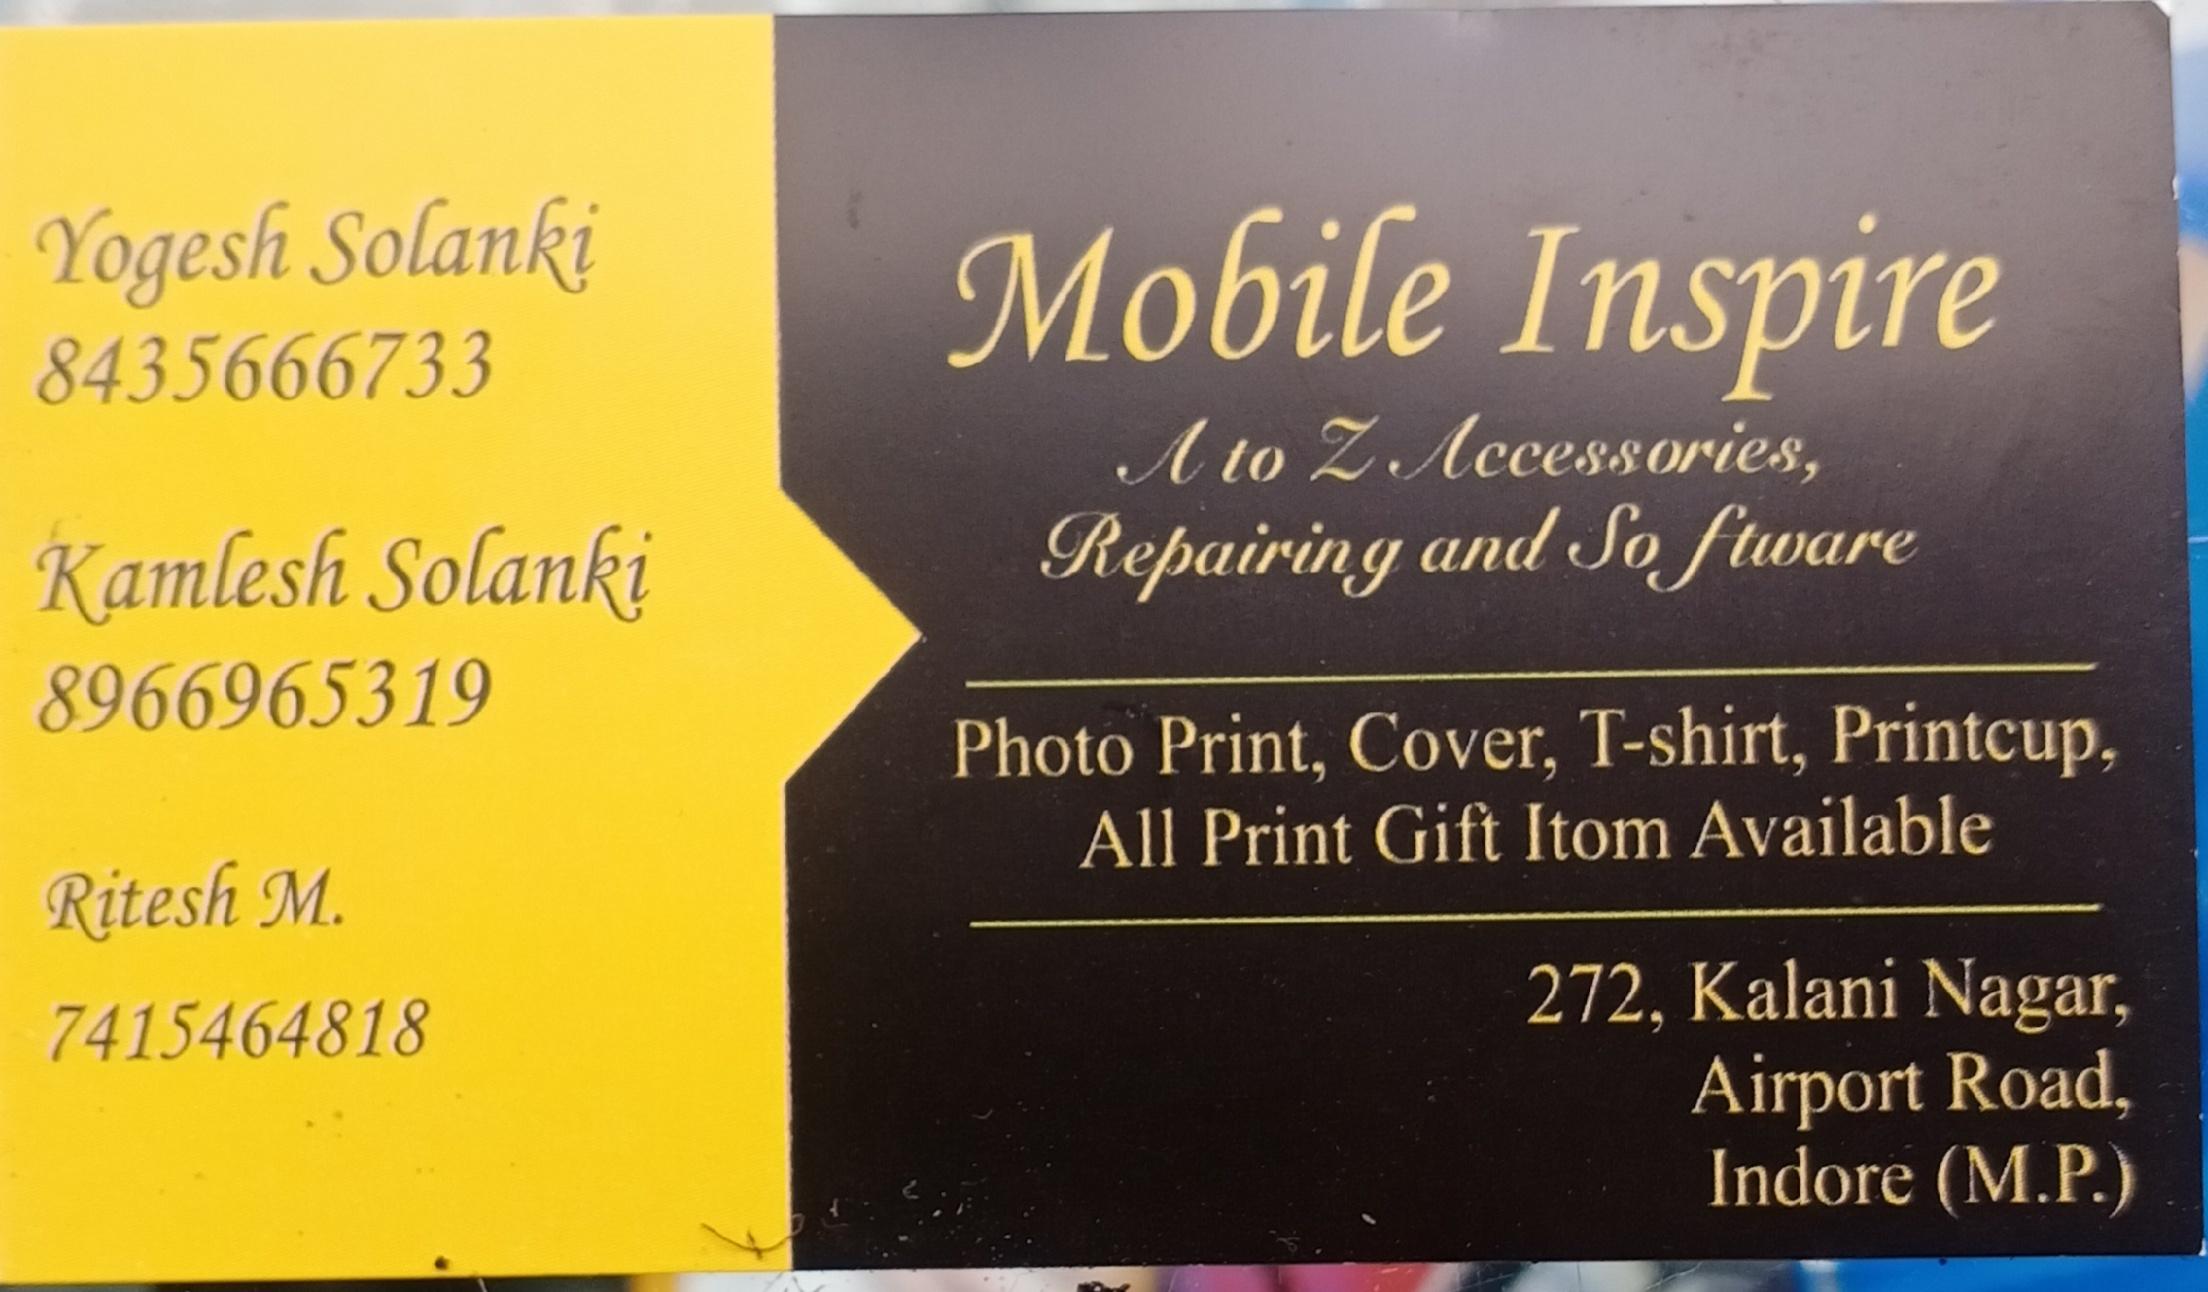 mobile inspire